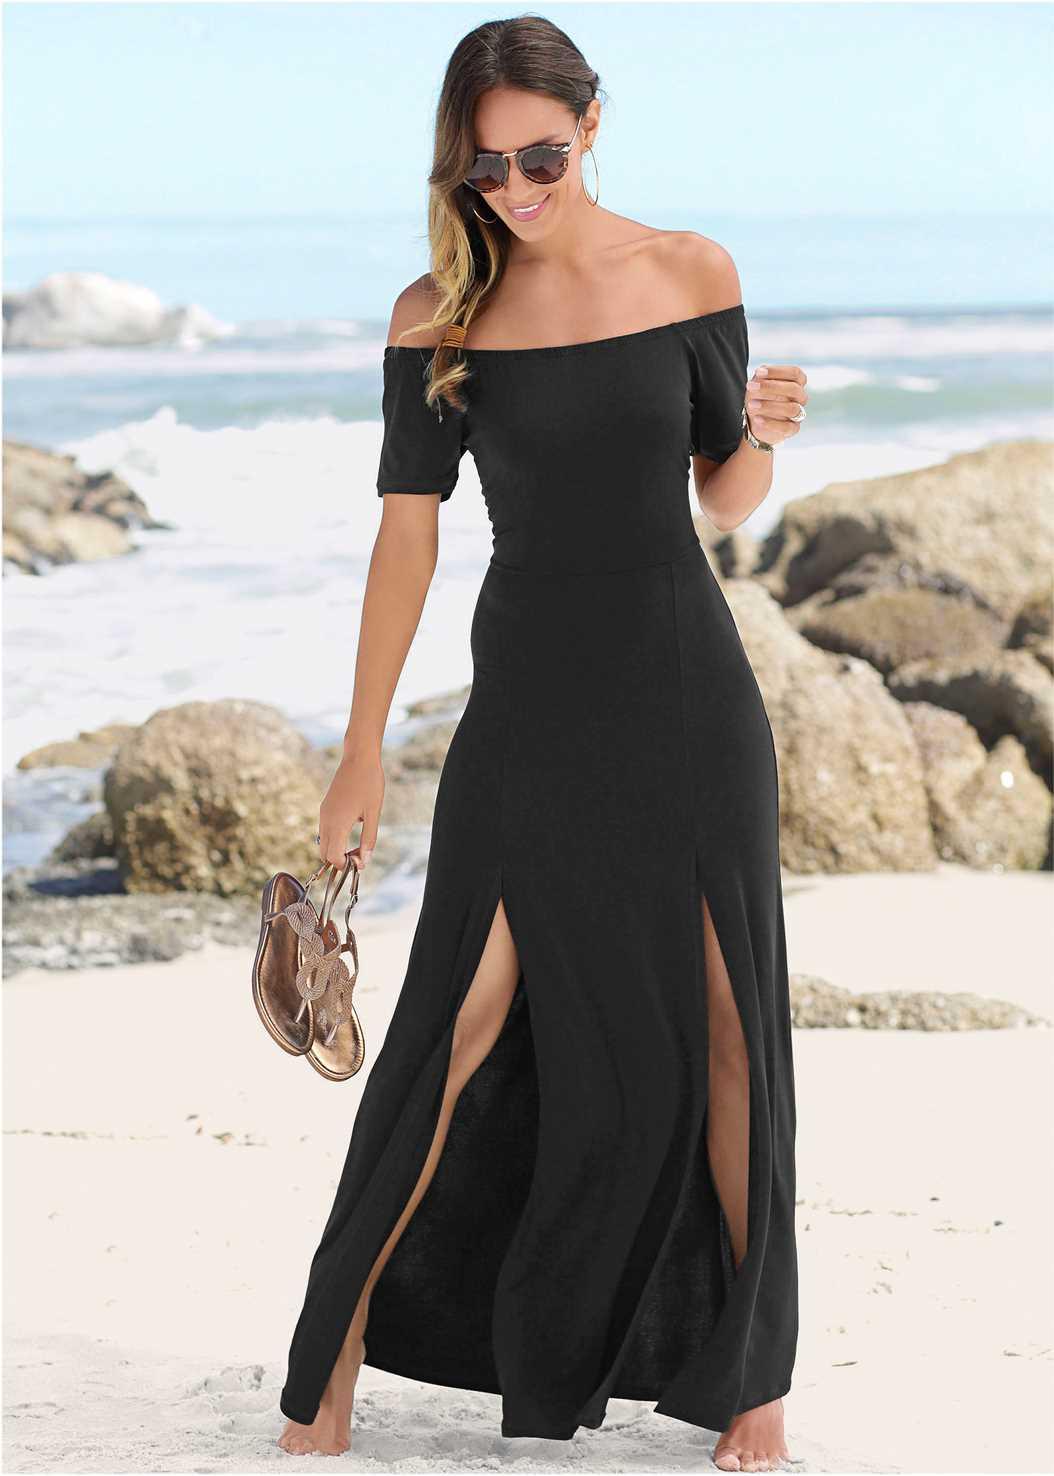 Slit Detail Maxi Dress,Metallic Strap Sandals